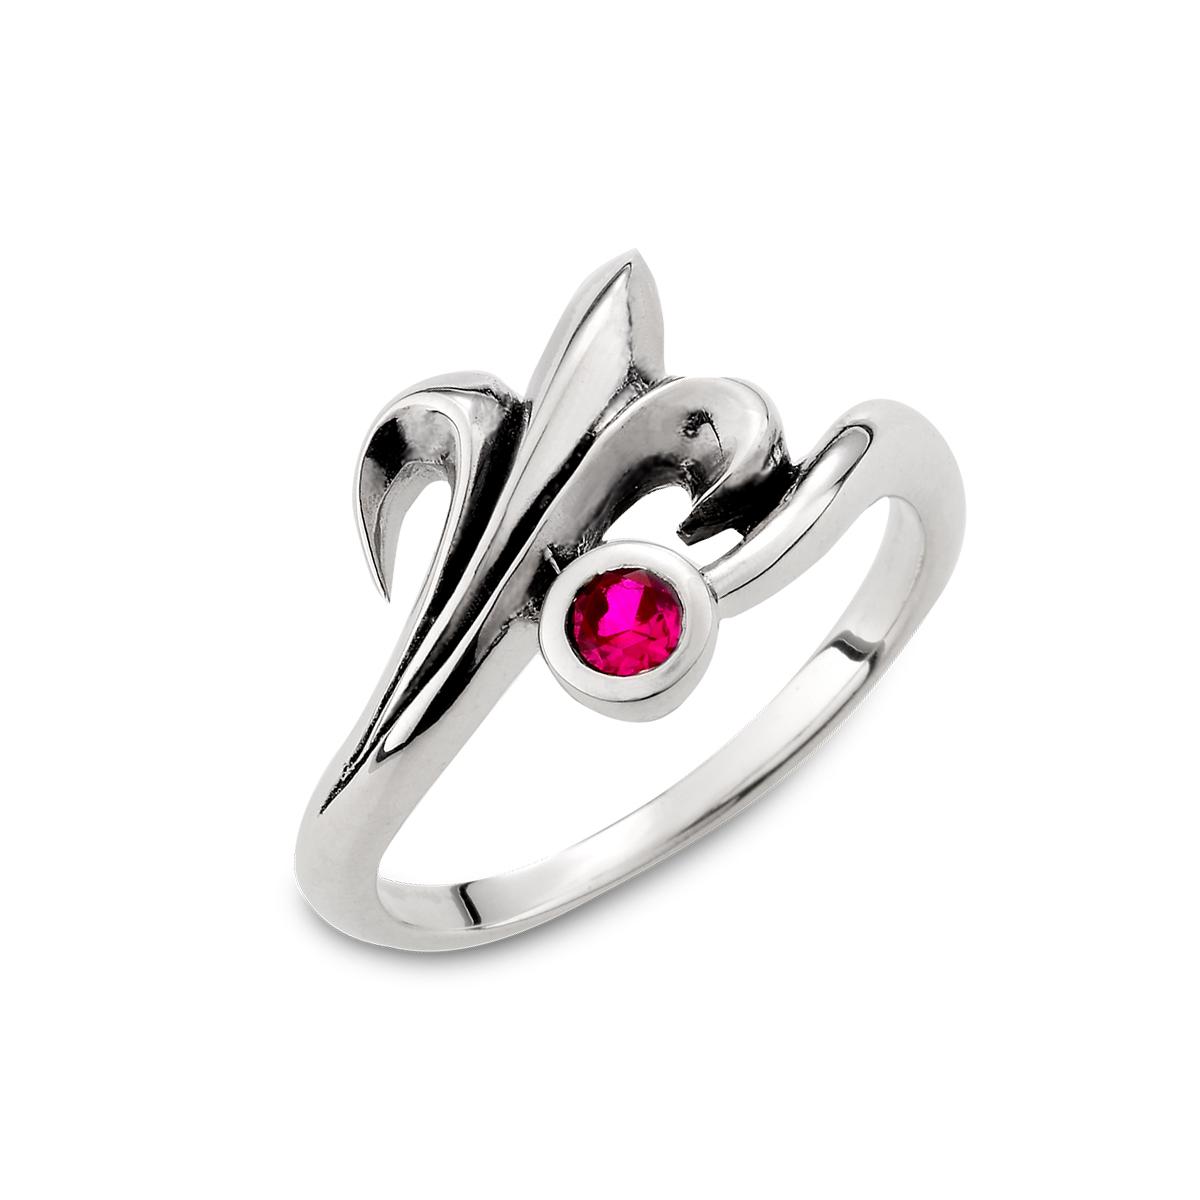 KSM96 硫化紅心矛個性戒指